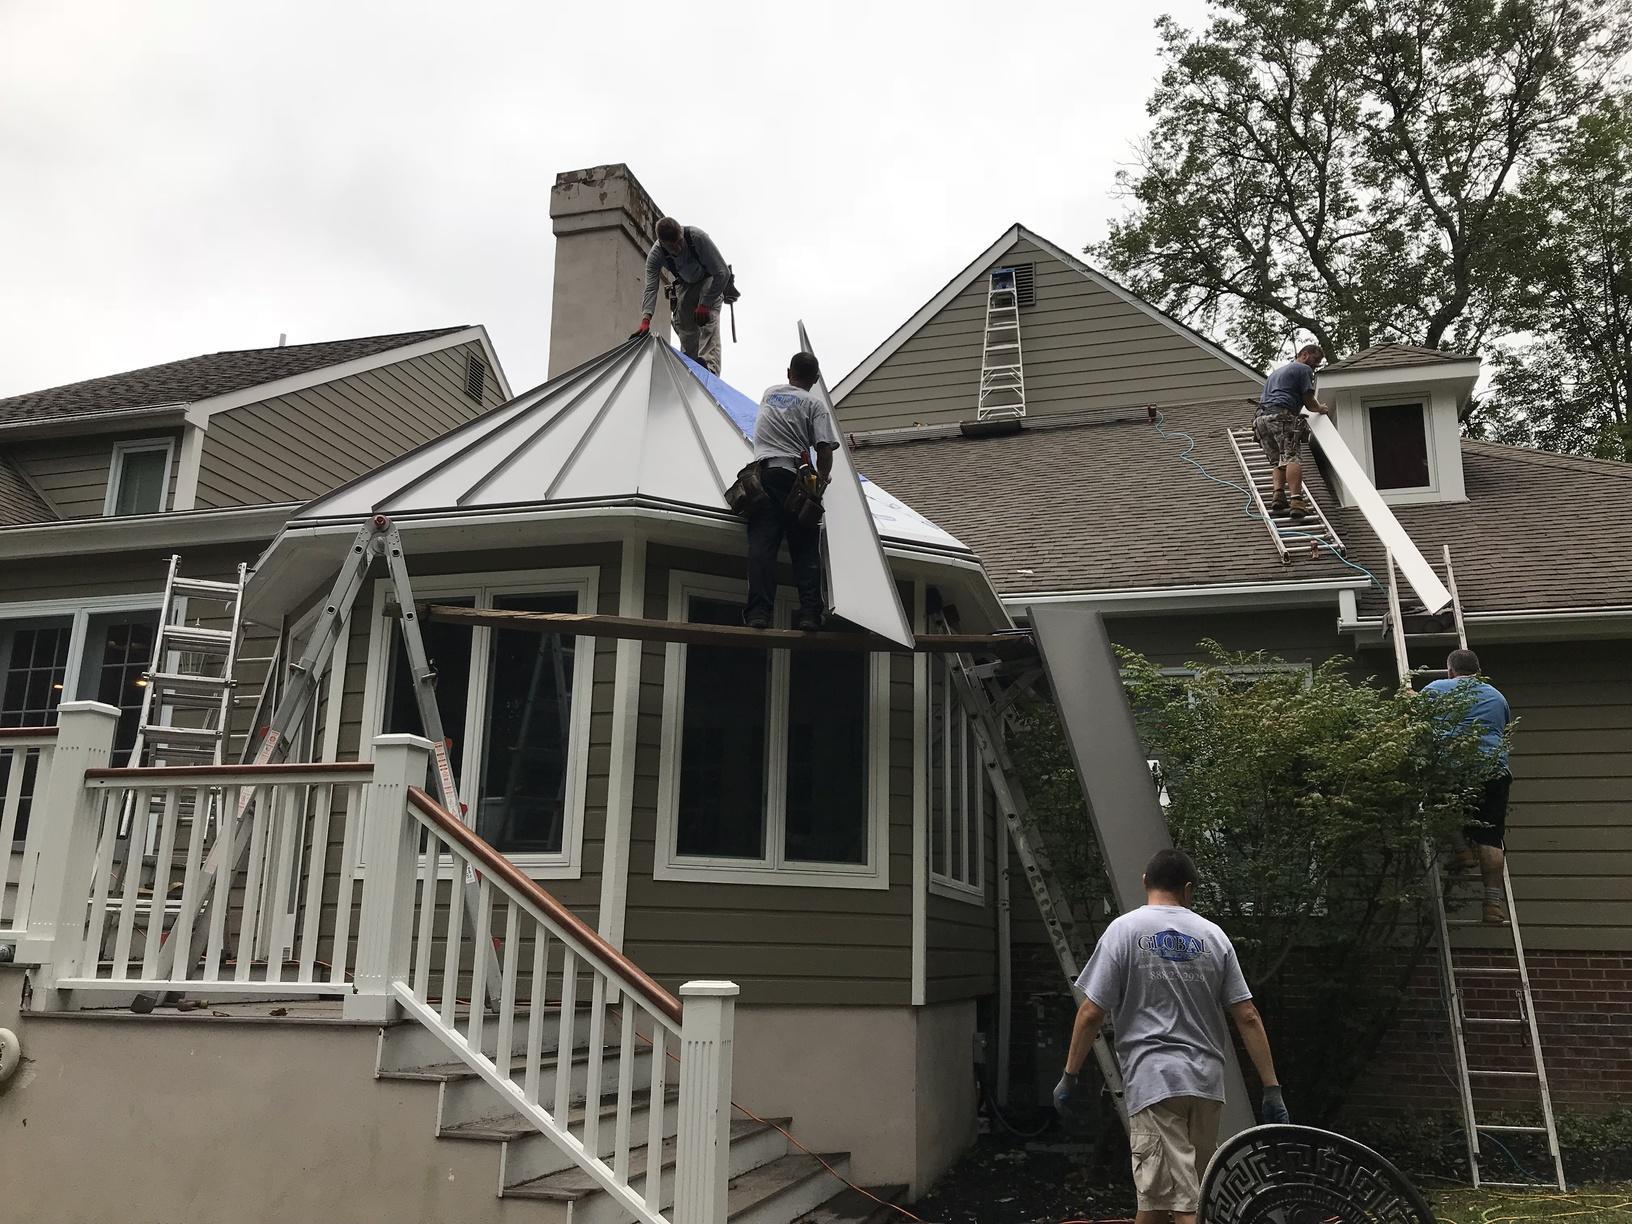 Installing Slate Grey Standing Seam Metal Roof in PA